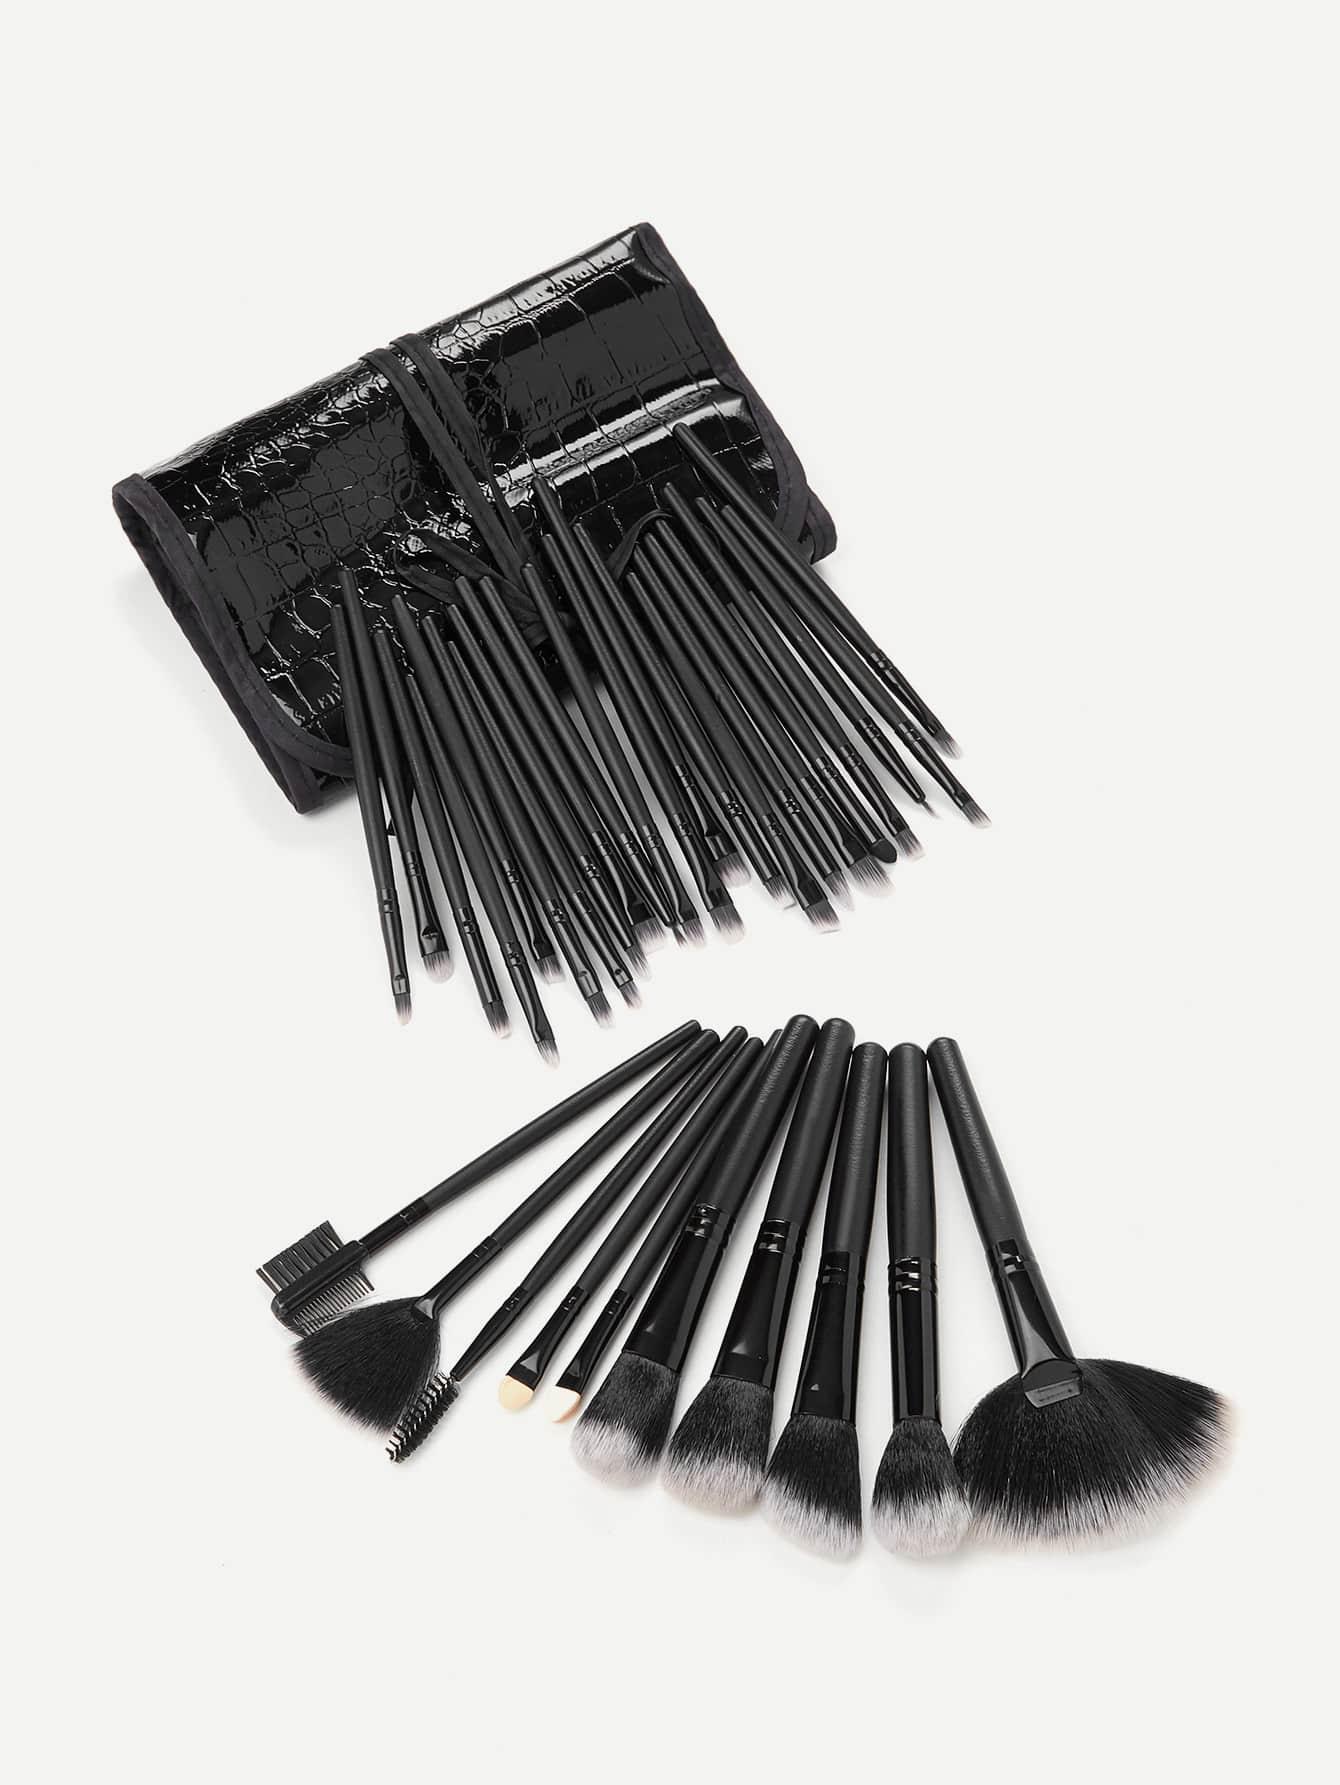 Professional Makeup Brush 32pcs With PU Bag tube professional 7 in 1 cosmetic makeup brush set w pu case purple